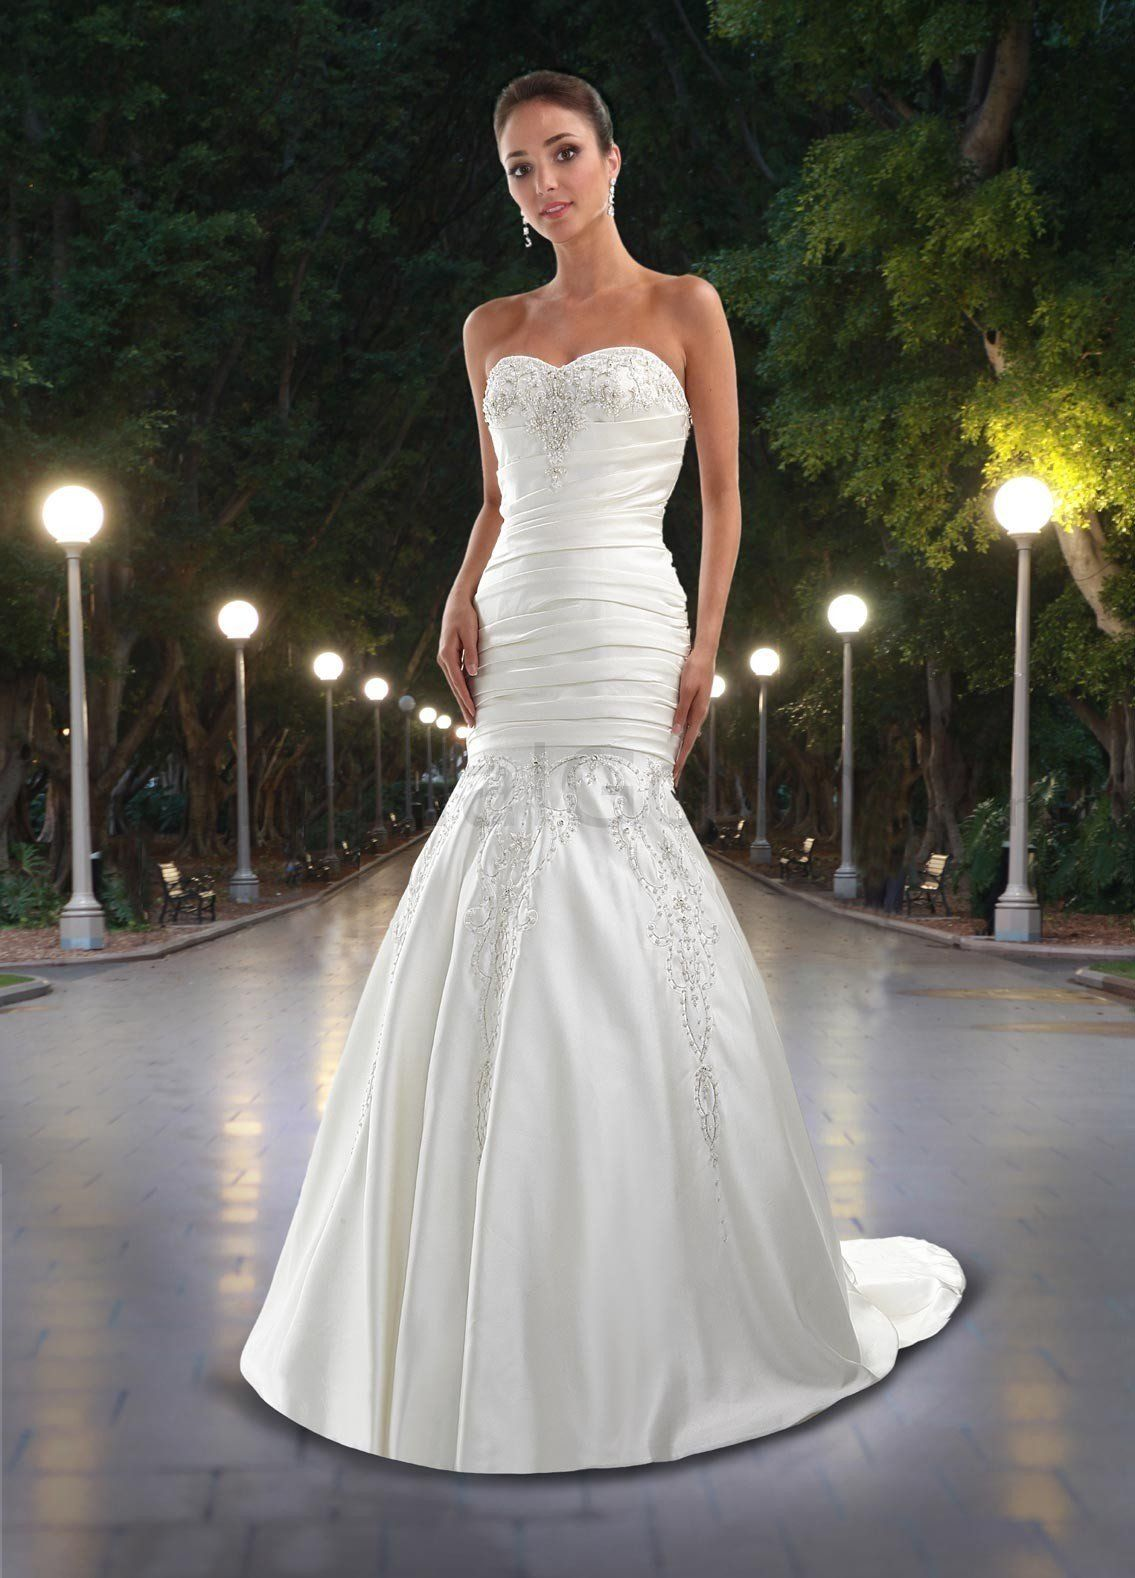 Corset Pleated Bodice Wedding Dress Dresses Australia: Pleated Bodice Strapless Wedding Dress At Reisefeber.org